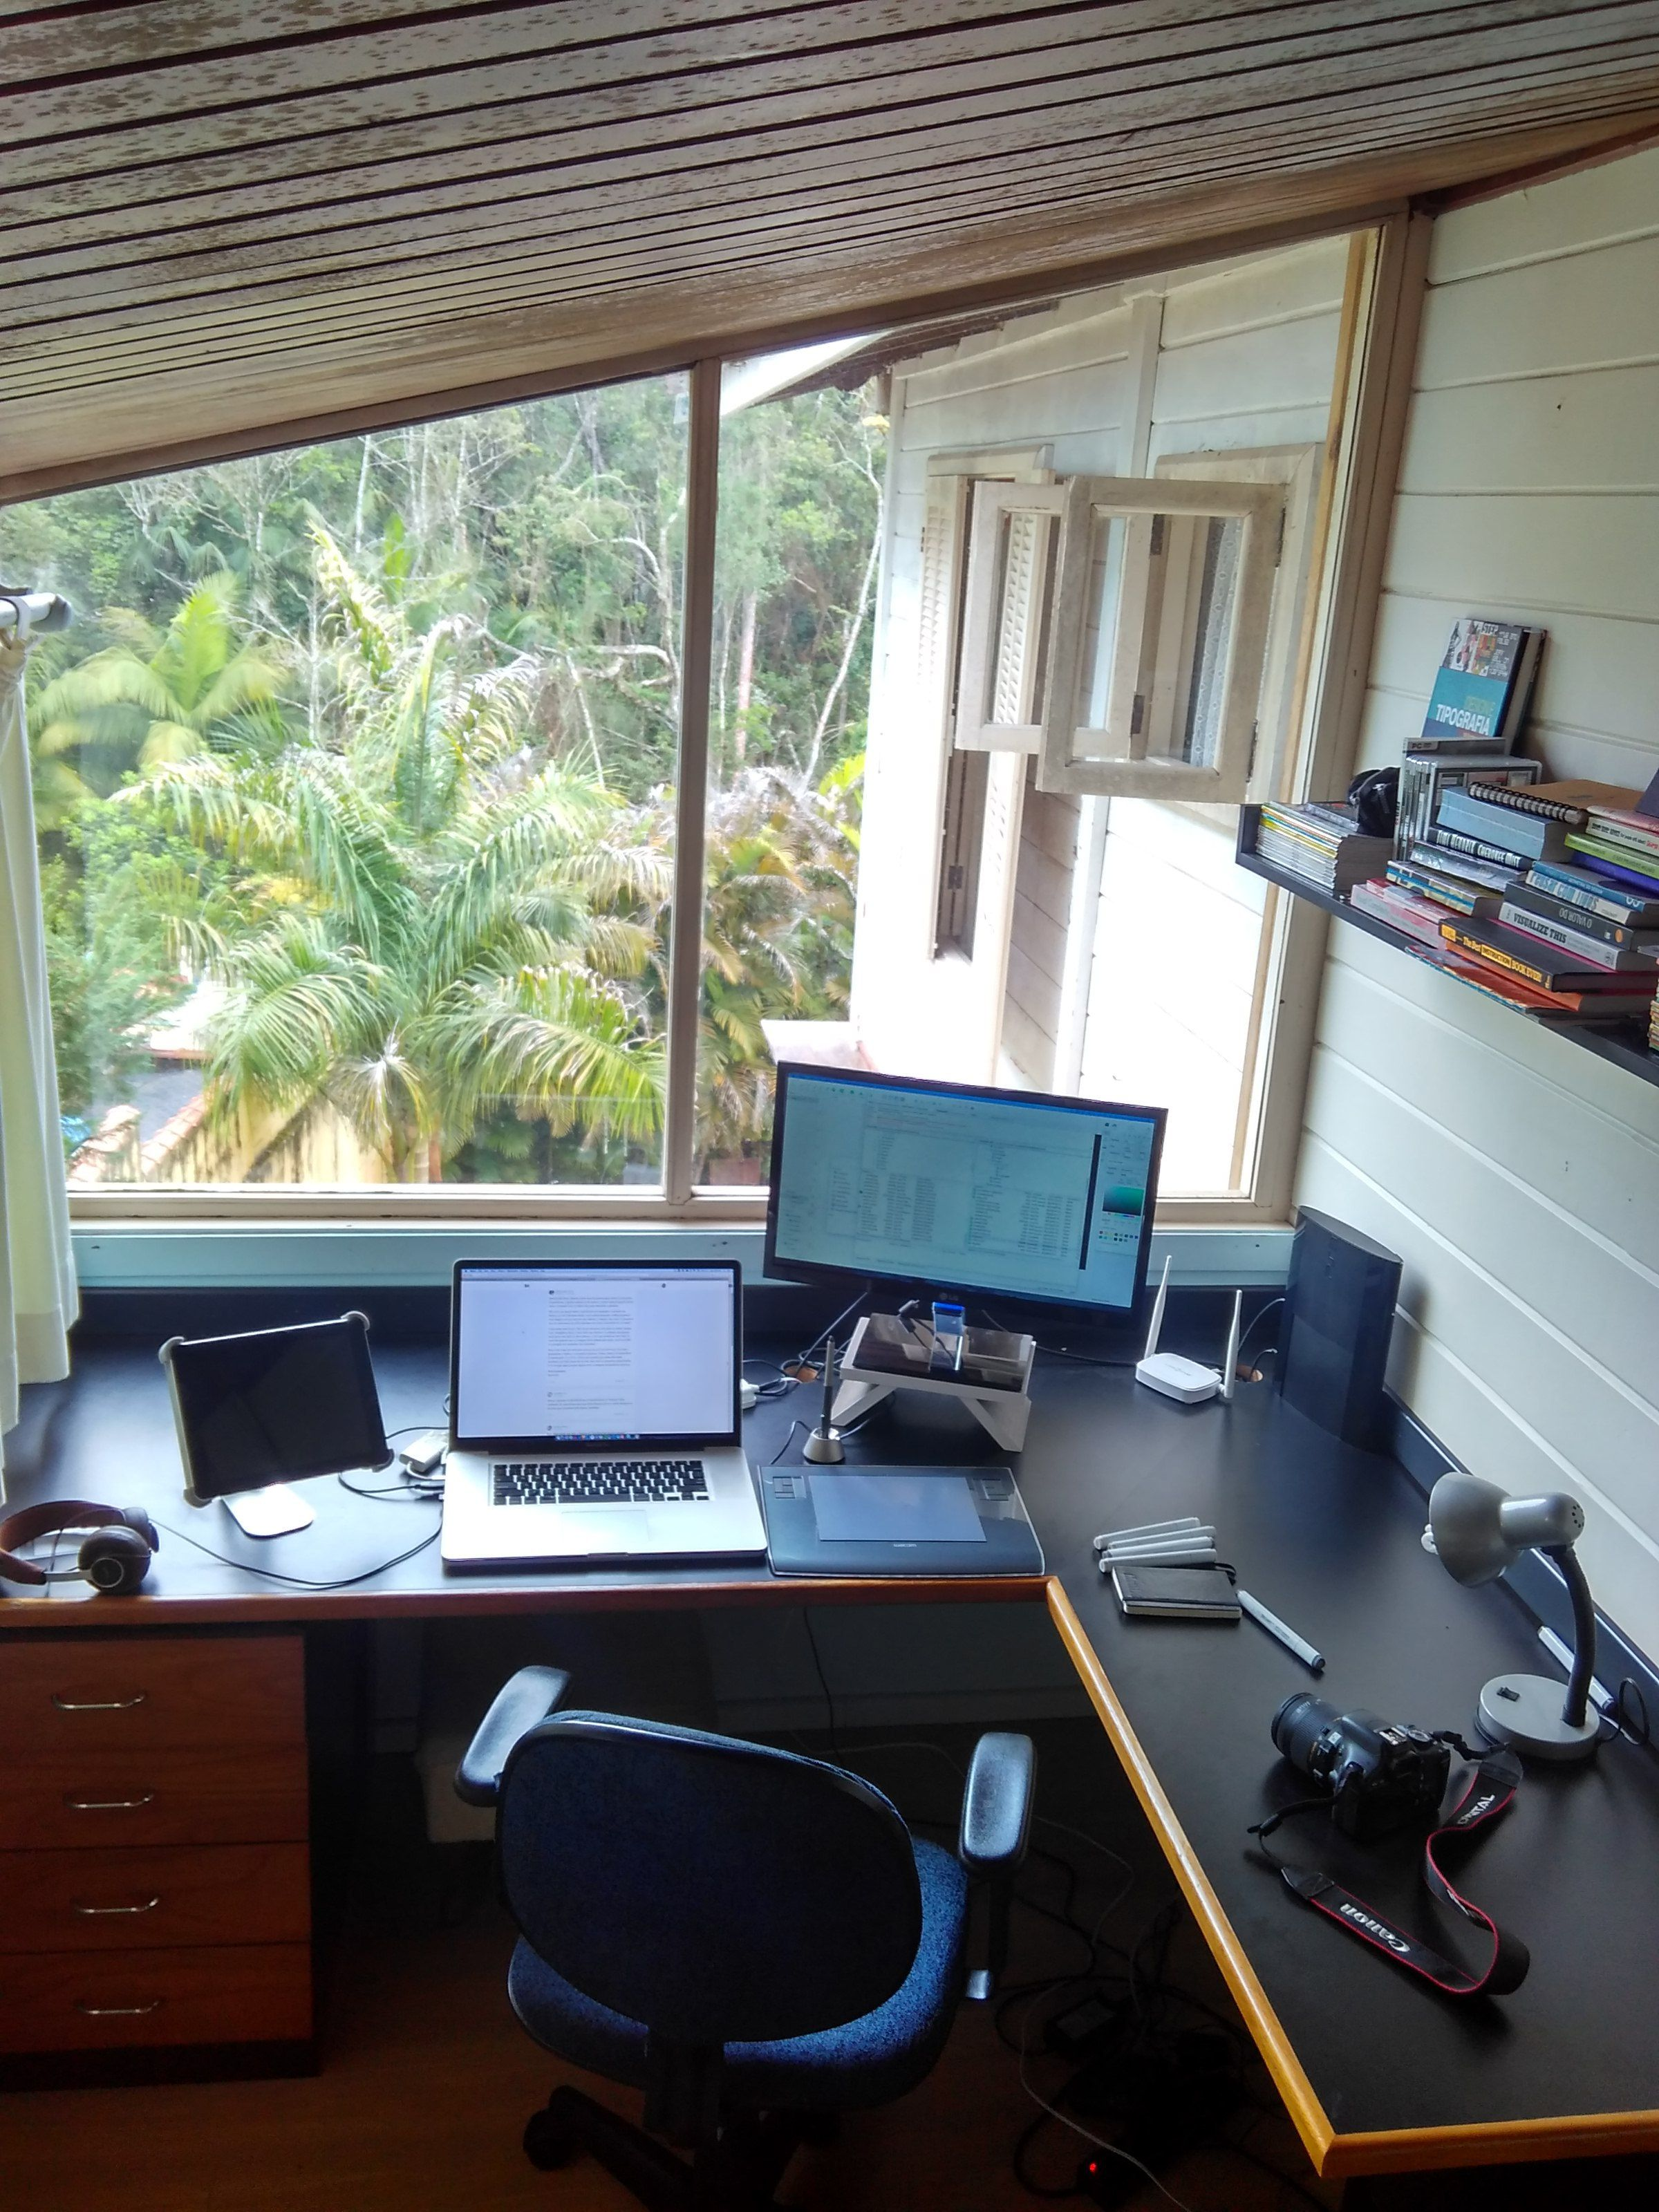 artist office. Minds Without Manacles, Freelancer, Digital Artist, Freelancing, Workplace, Victorluna Artist Office